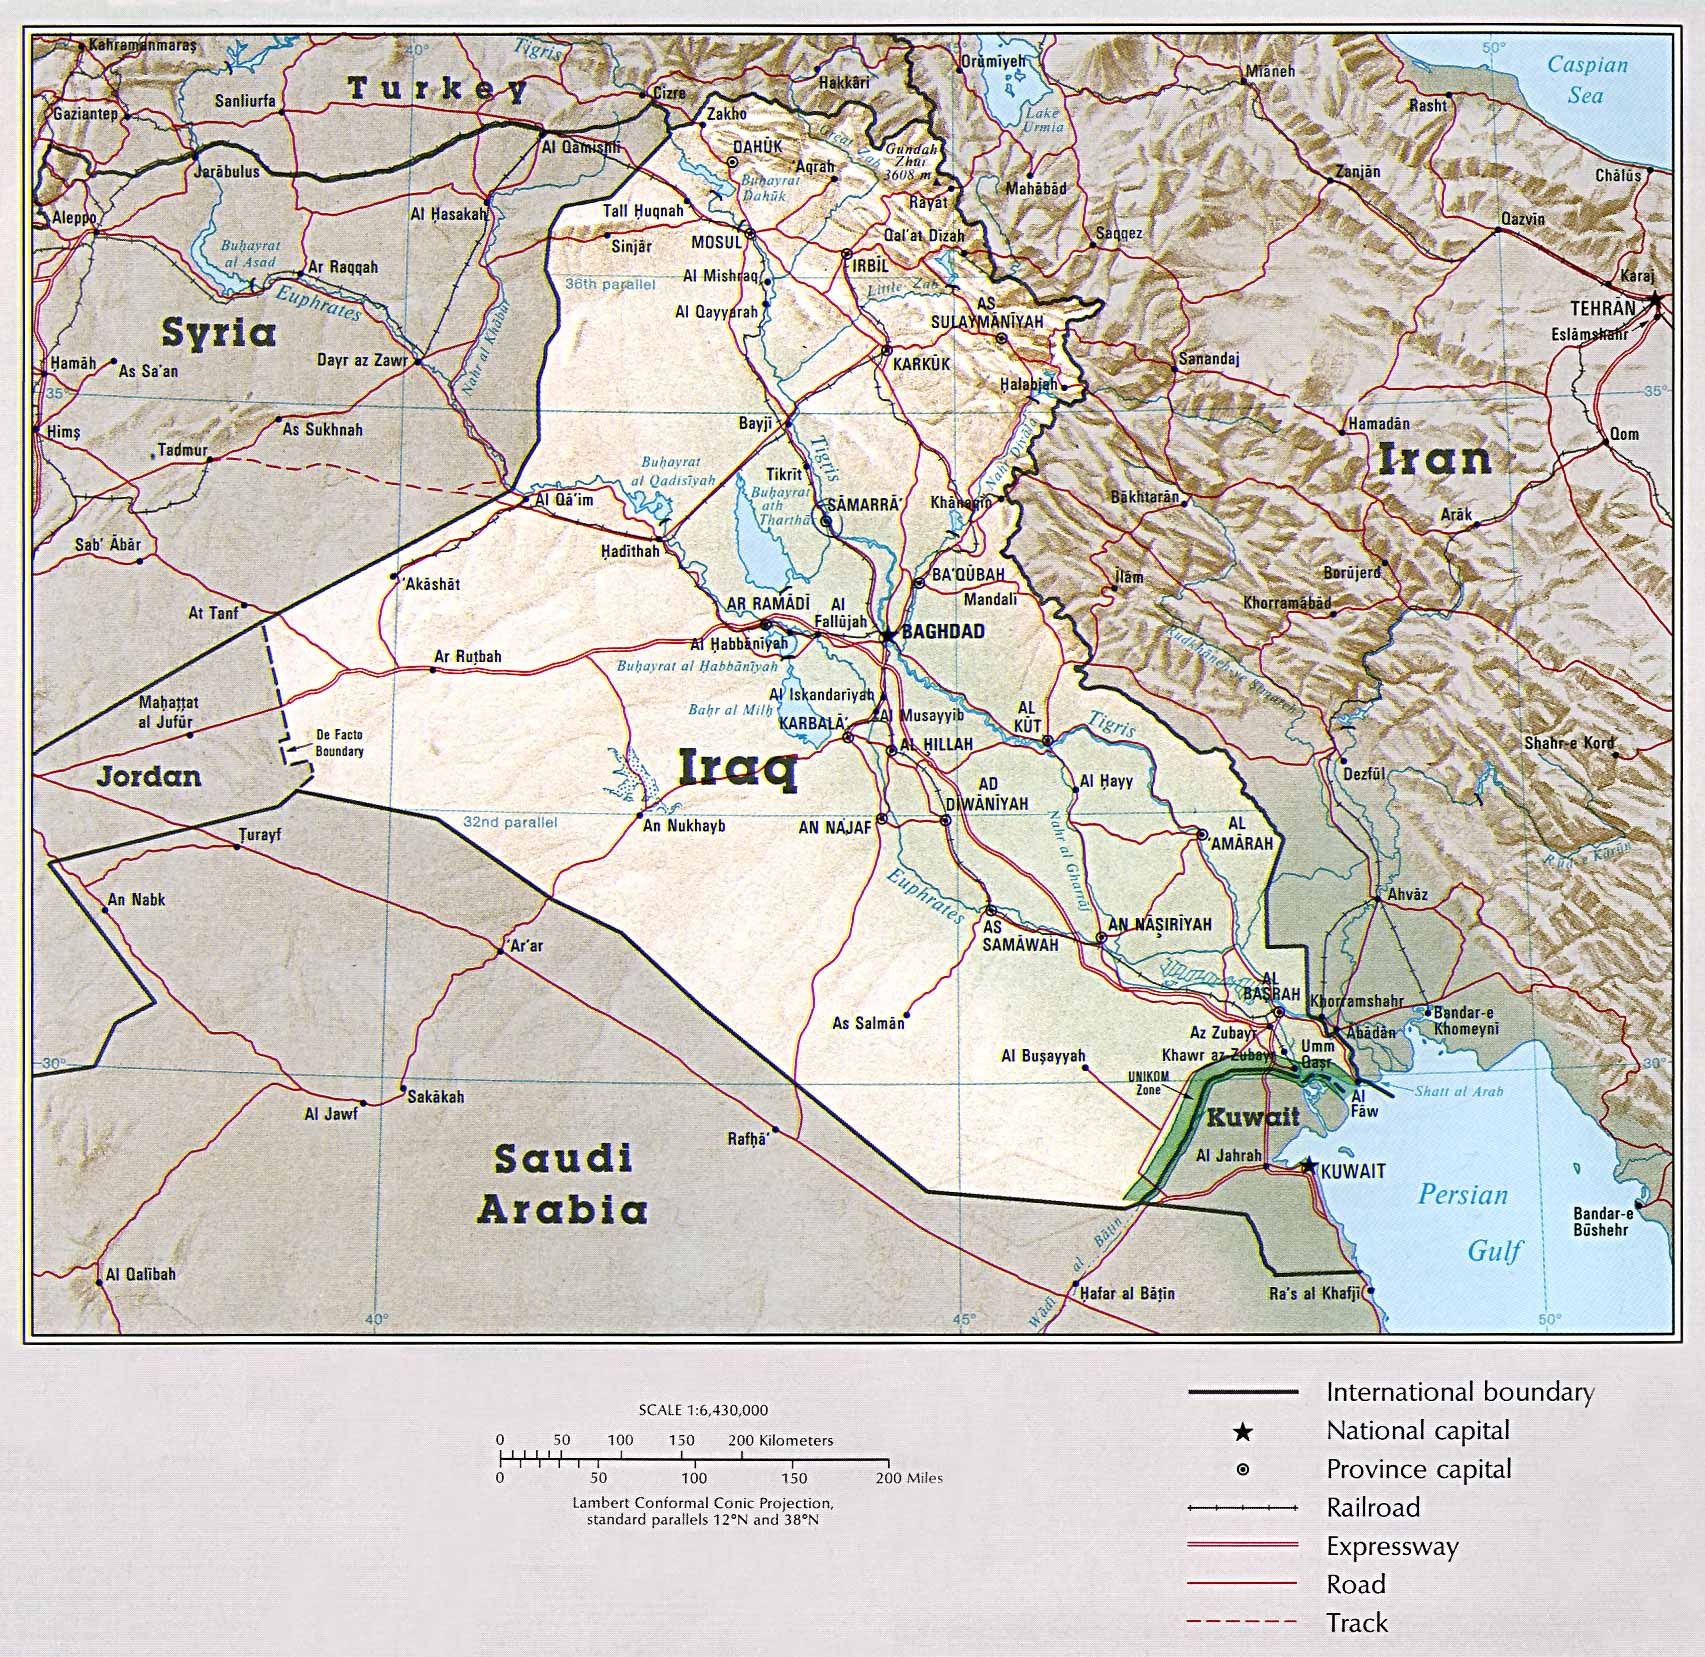 Iraqwho Com C Your Gateway To Iraq